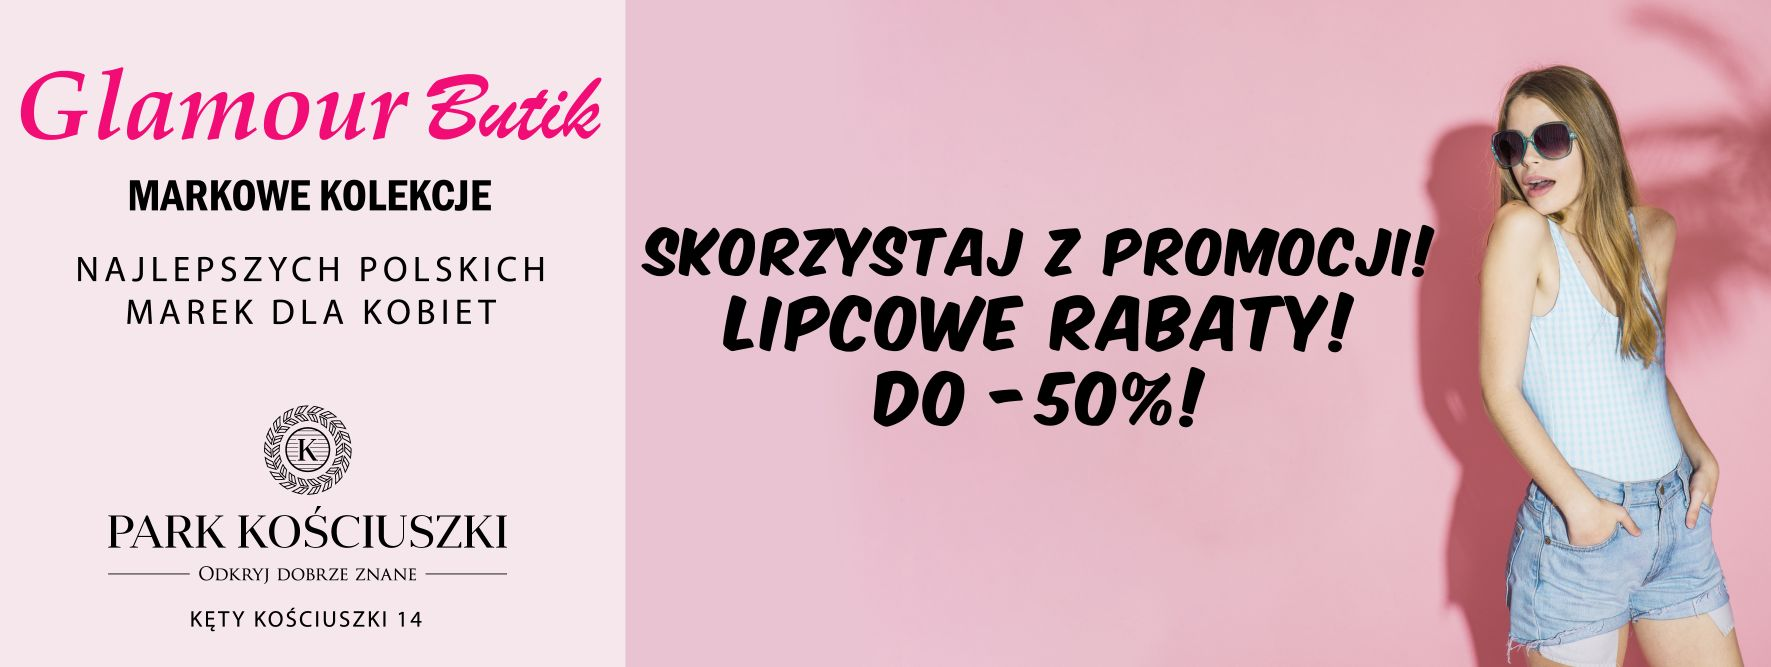 RABATY LIPCOWE. DO – 50% W GLAMOUR BUTIK!